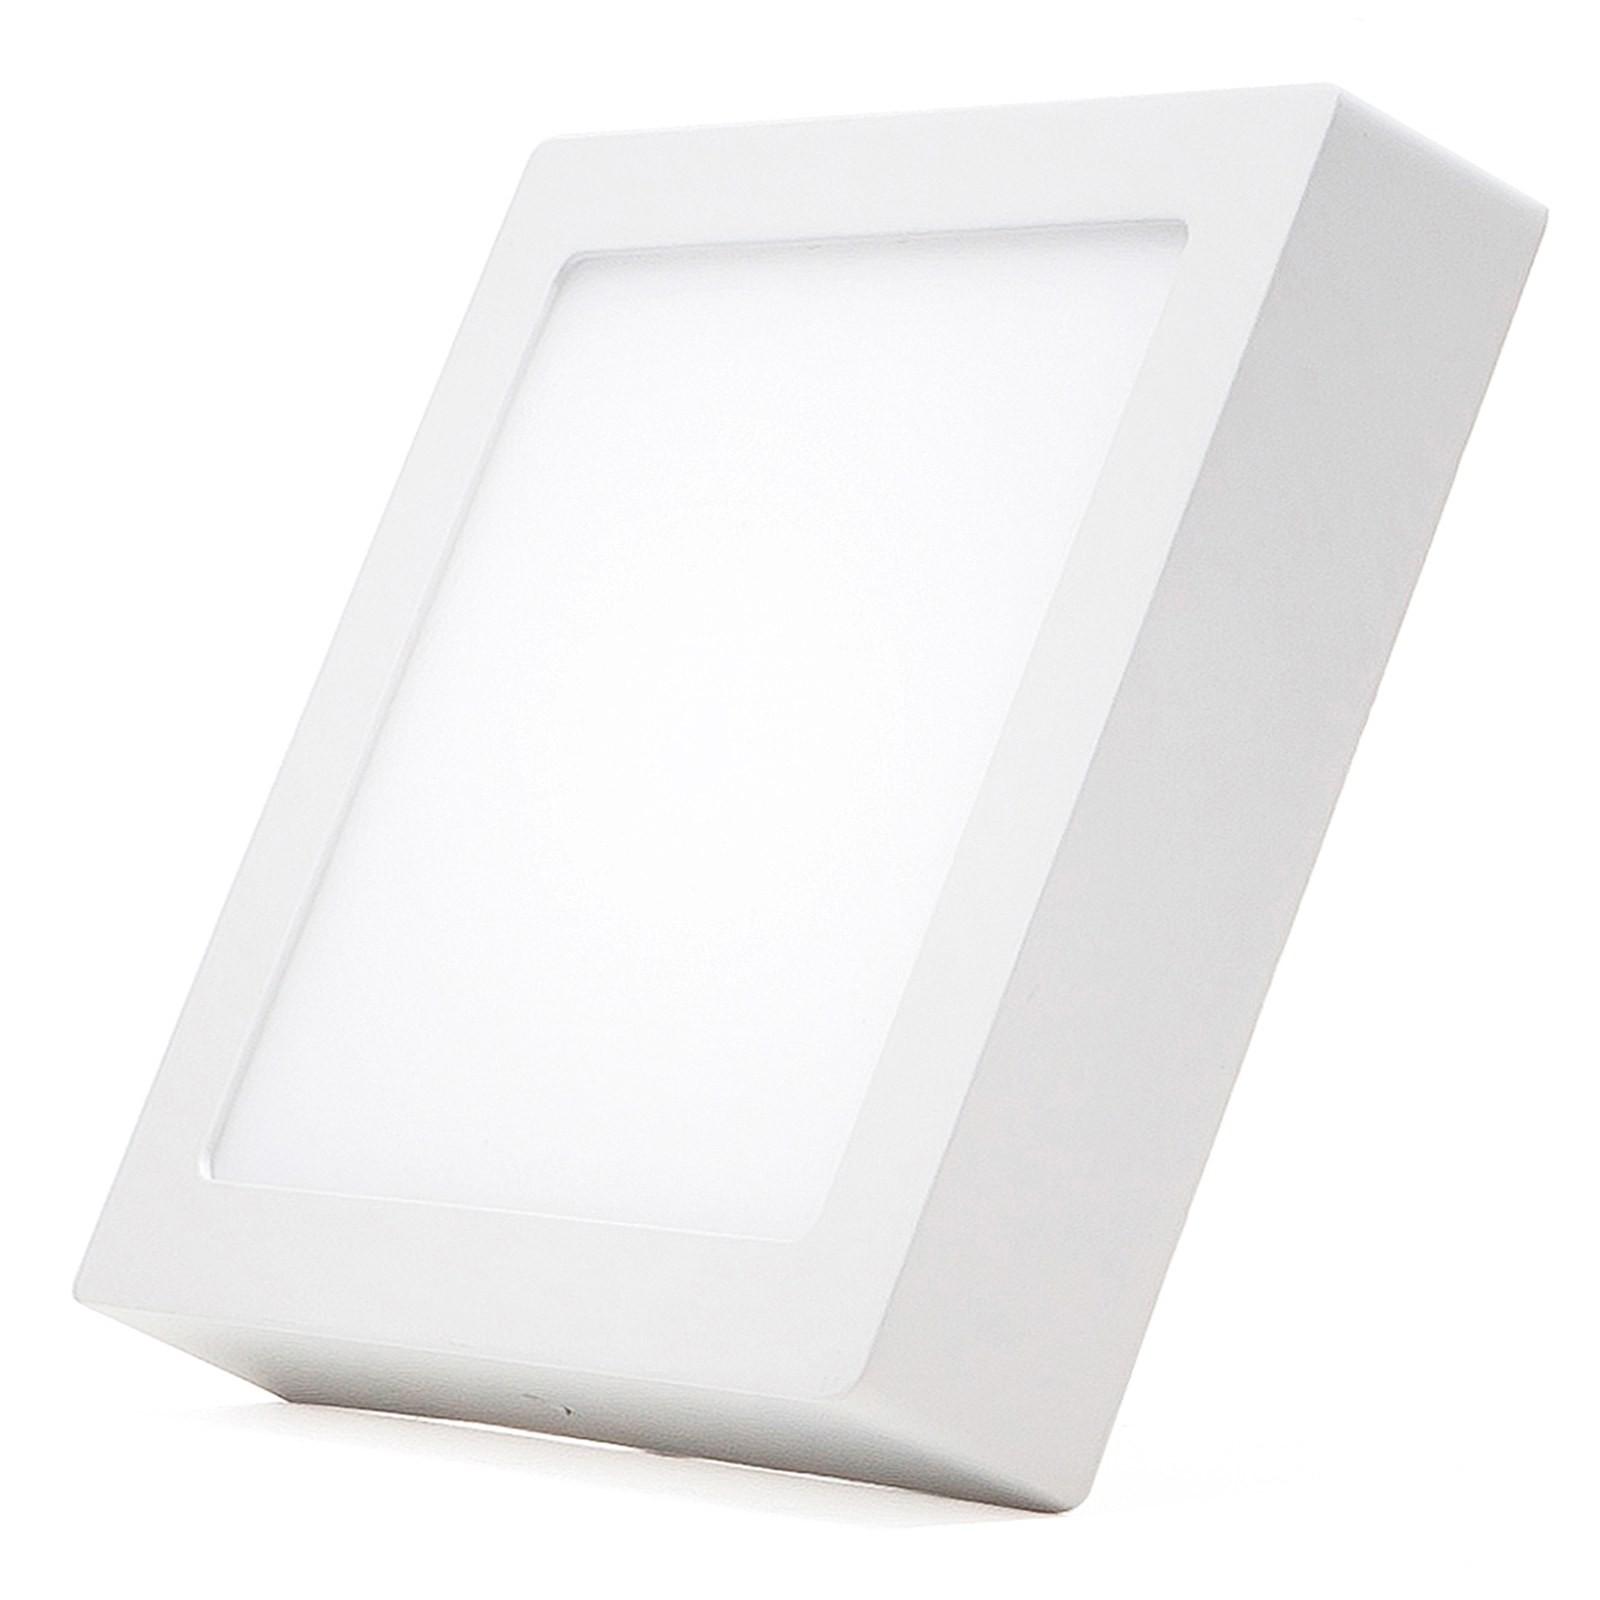 Plafoniera faretto pannello led luce bianca fredda 12 watt for Luce bianca led